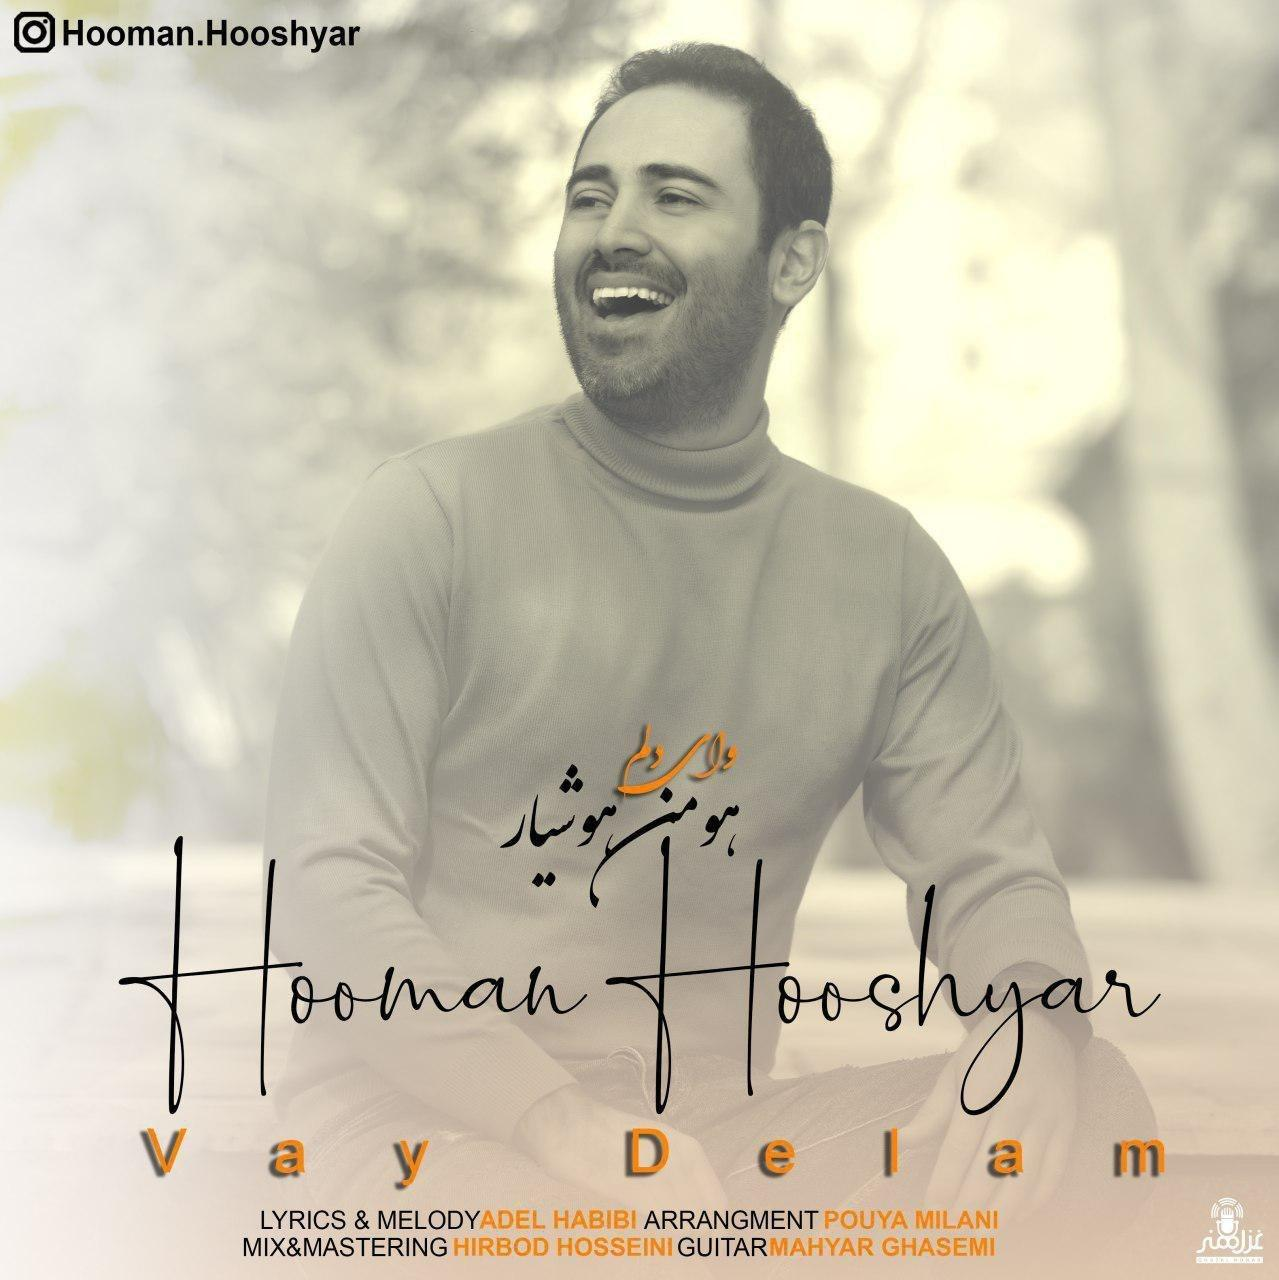 Hooman Hooshyar – Vay Delam